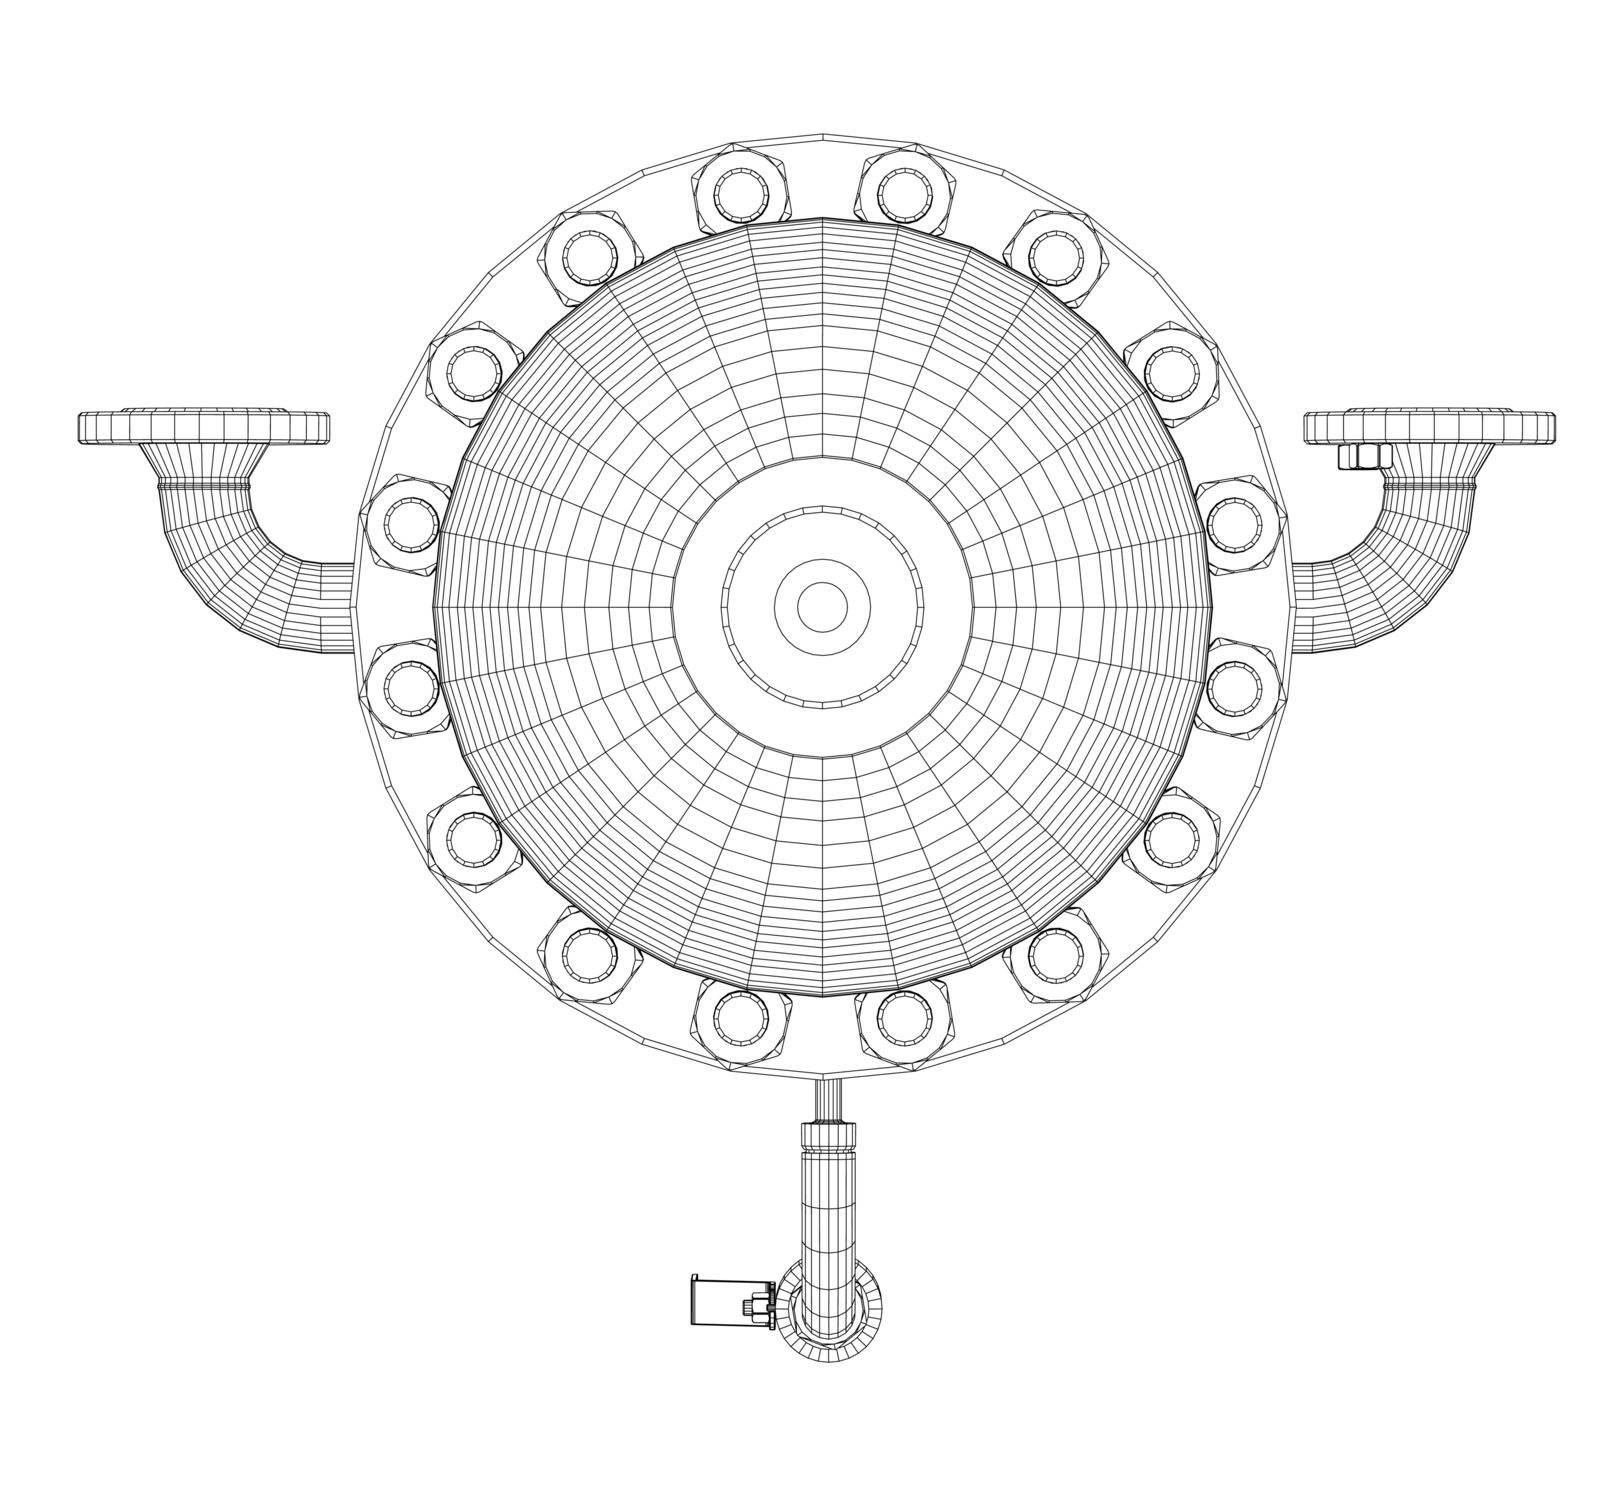 Wire-frame industrial equipment. EPS 10 vector format. Vector rendering of 3d